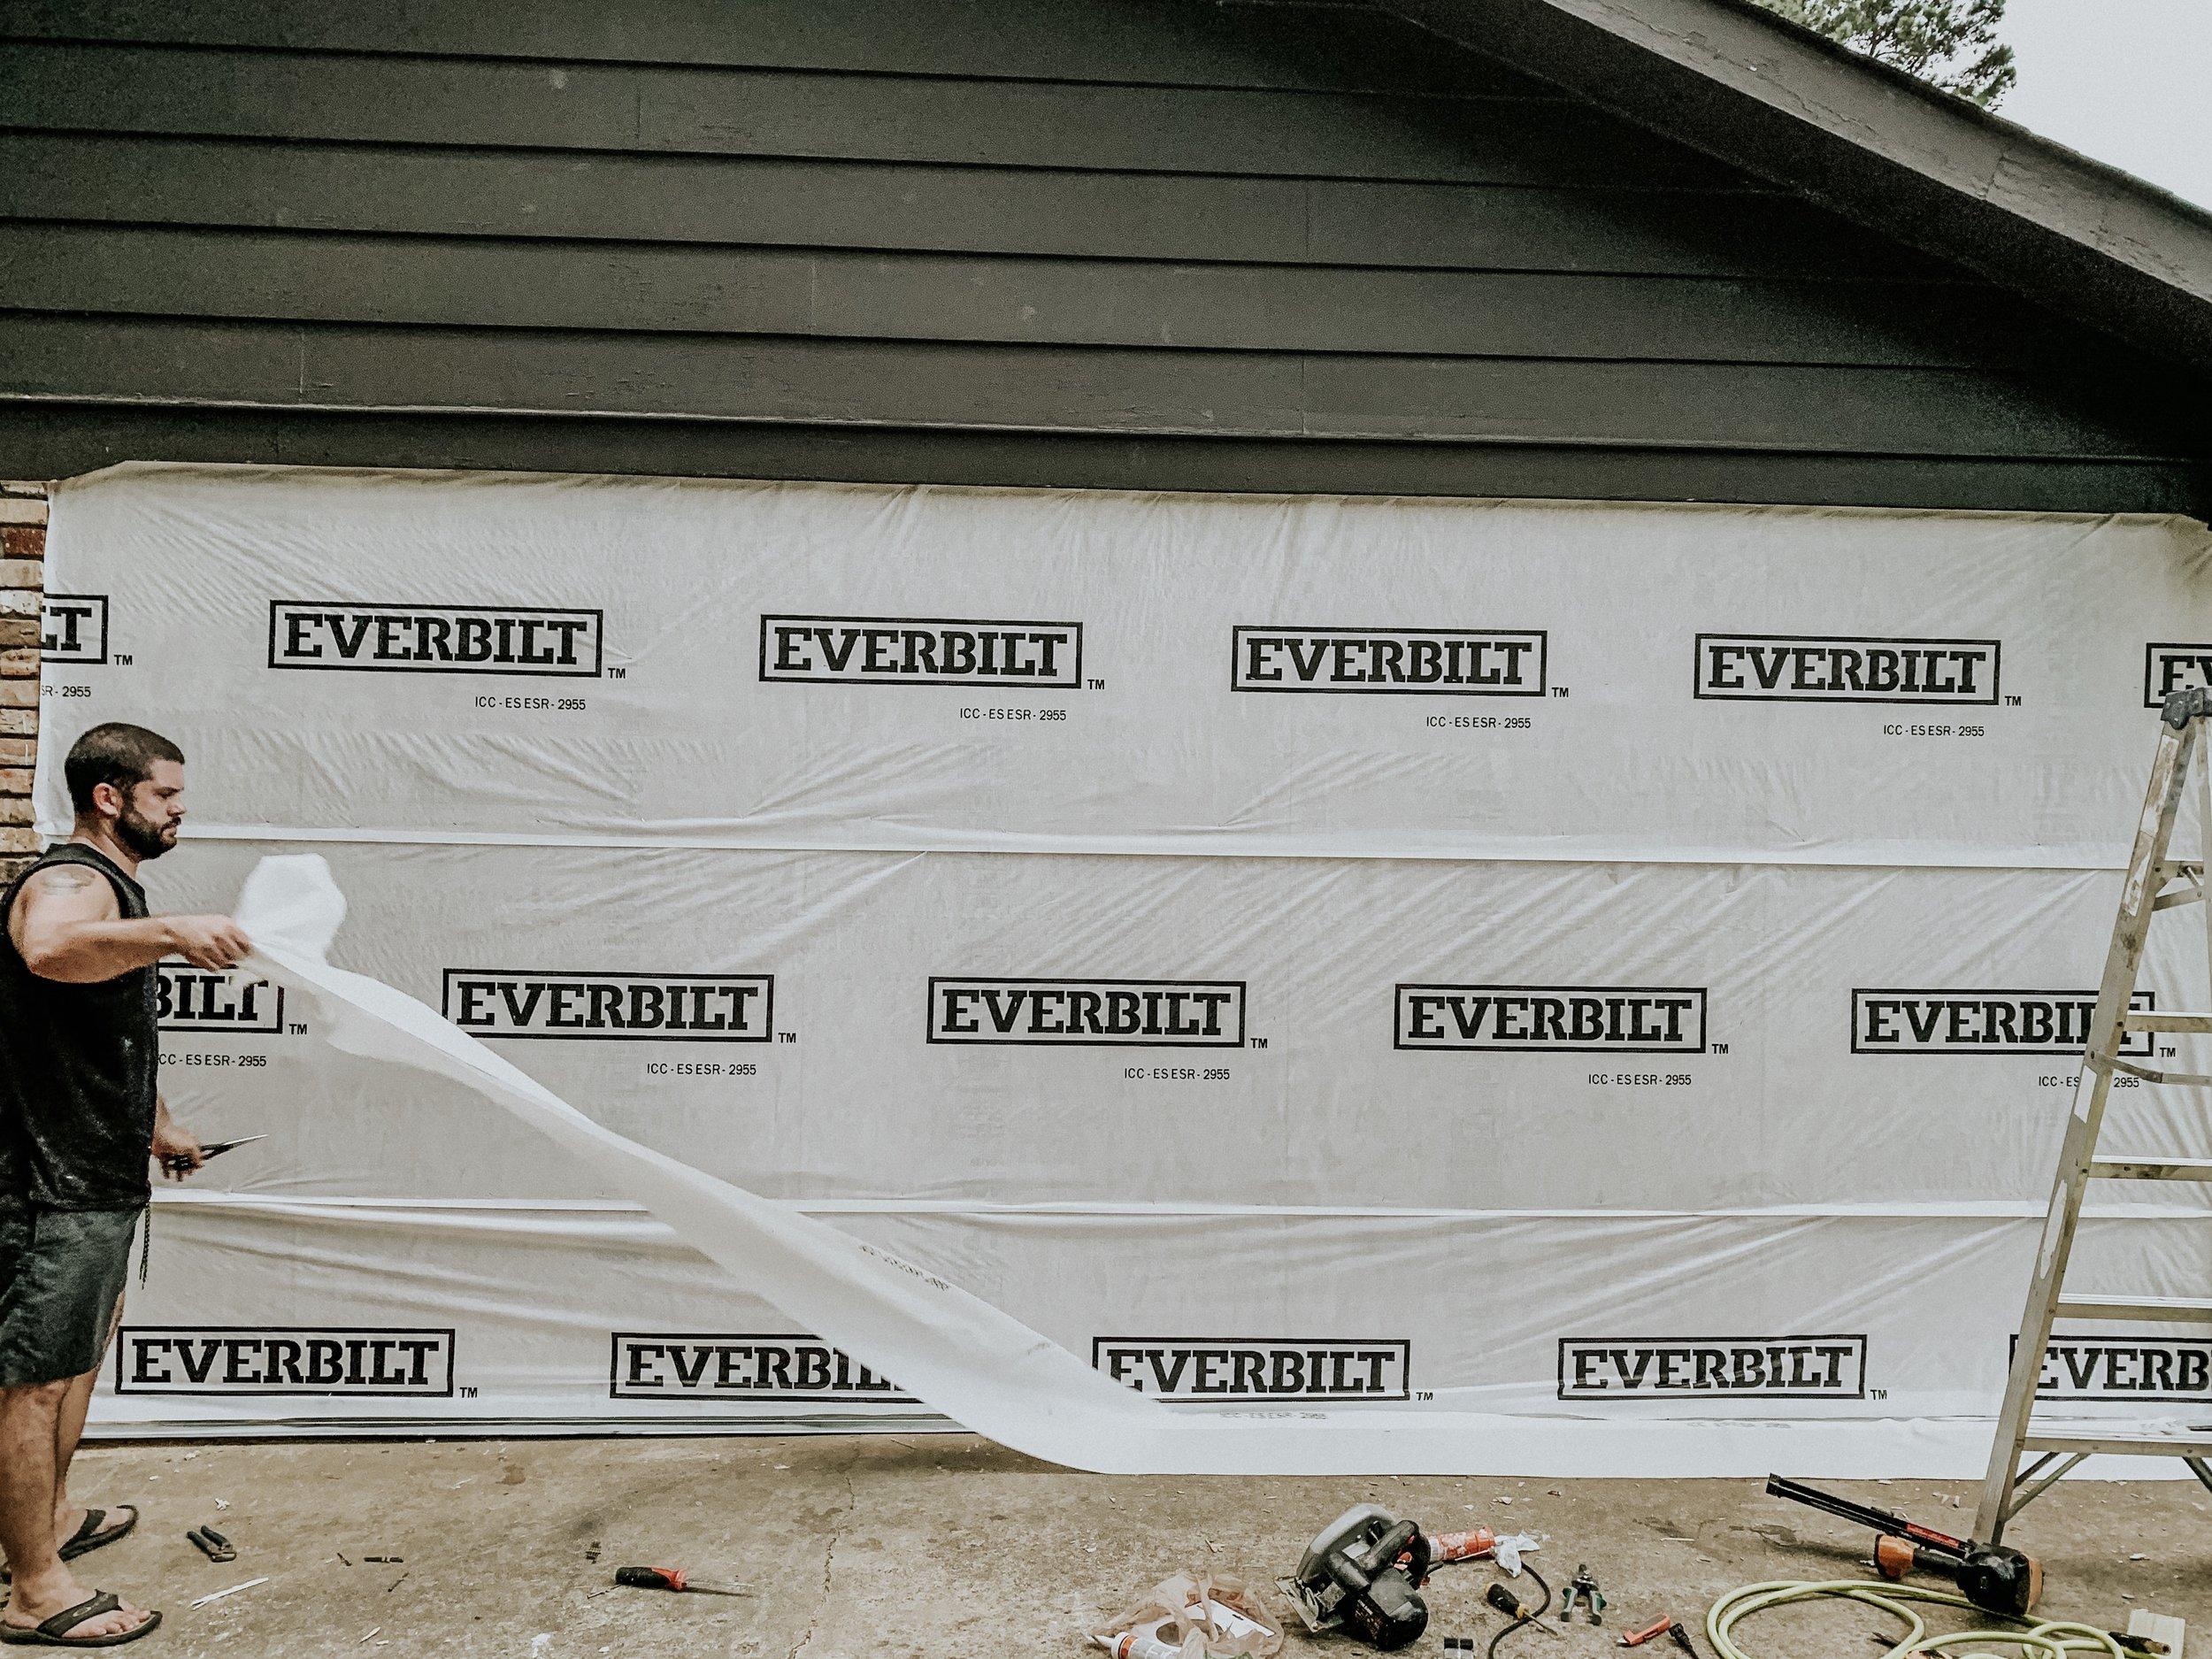 Applying Everbilt water vapor barrier to exterior of home